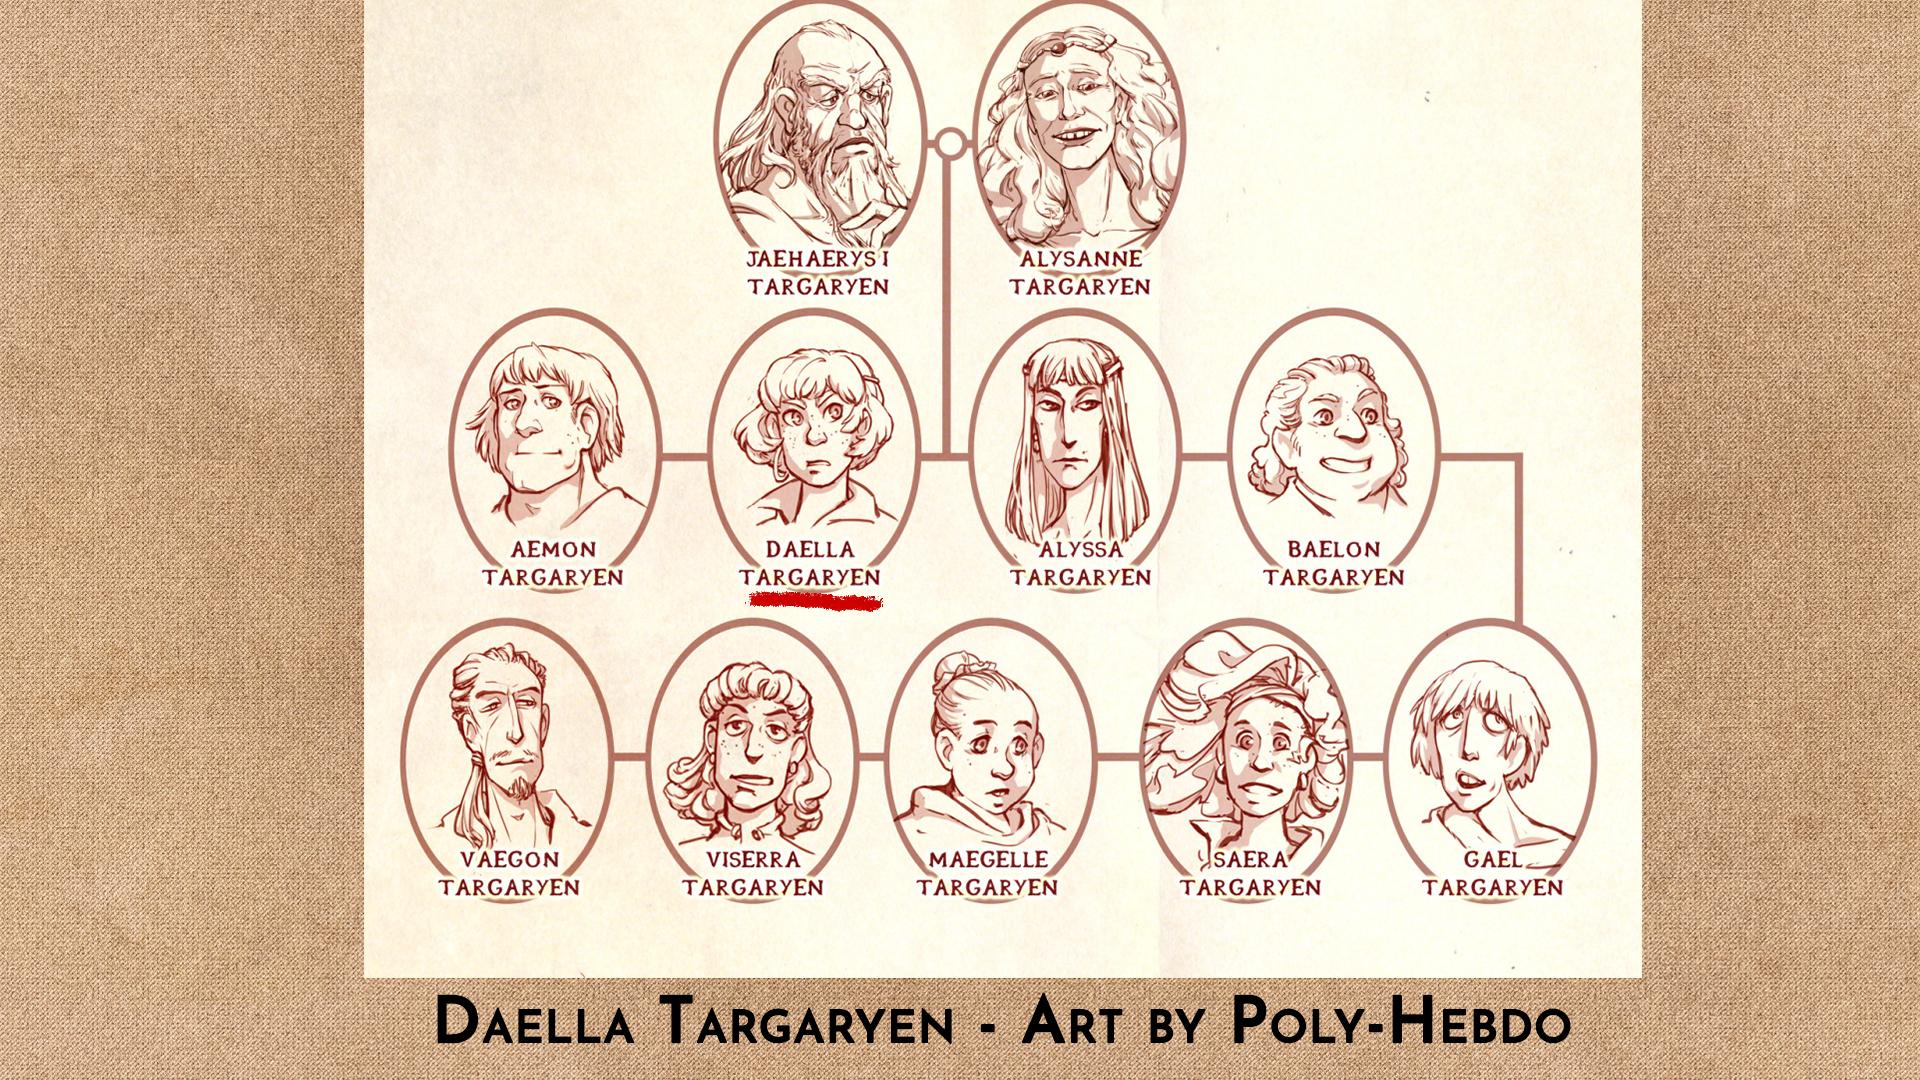 Daella Targaryen by Poly-Hebdo